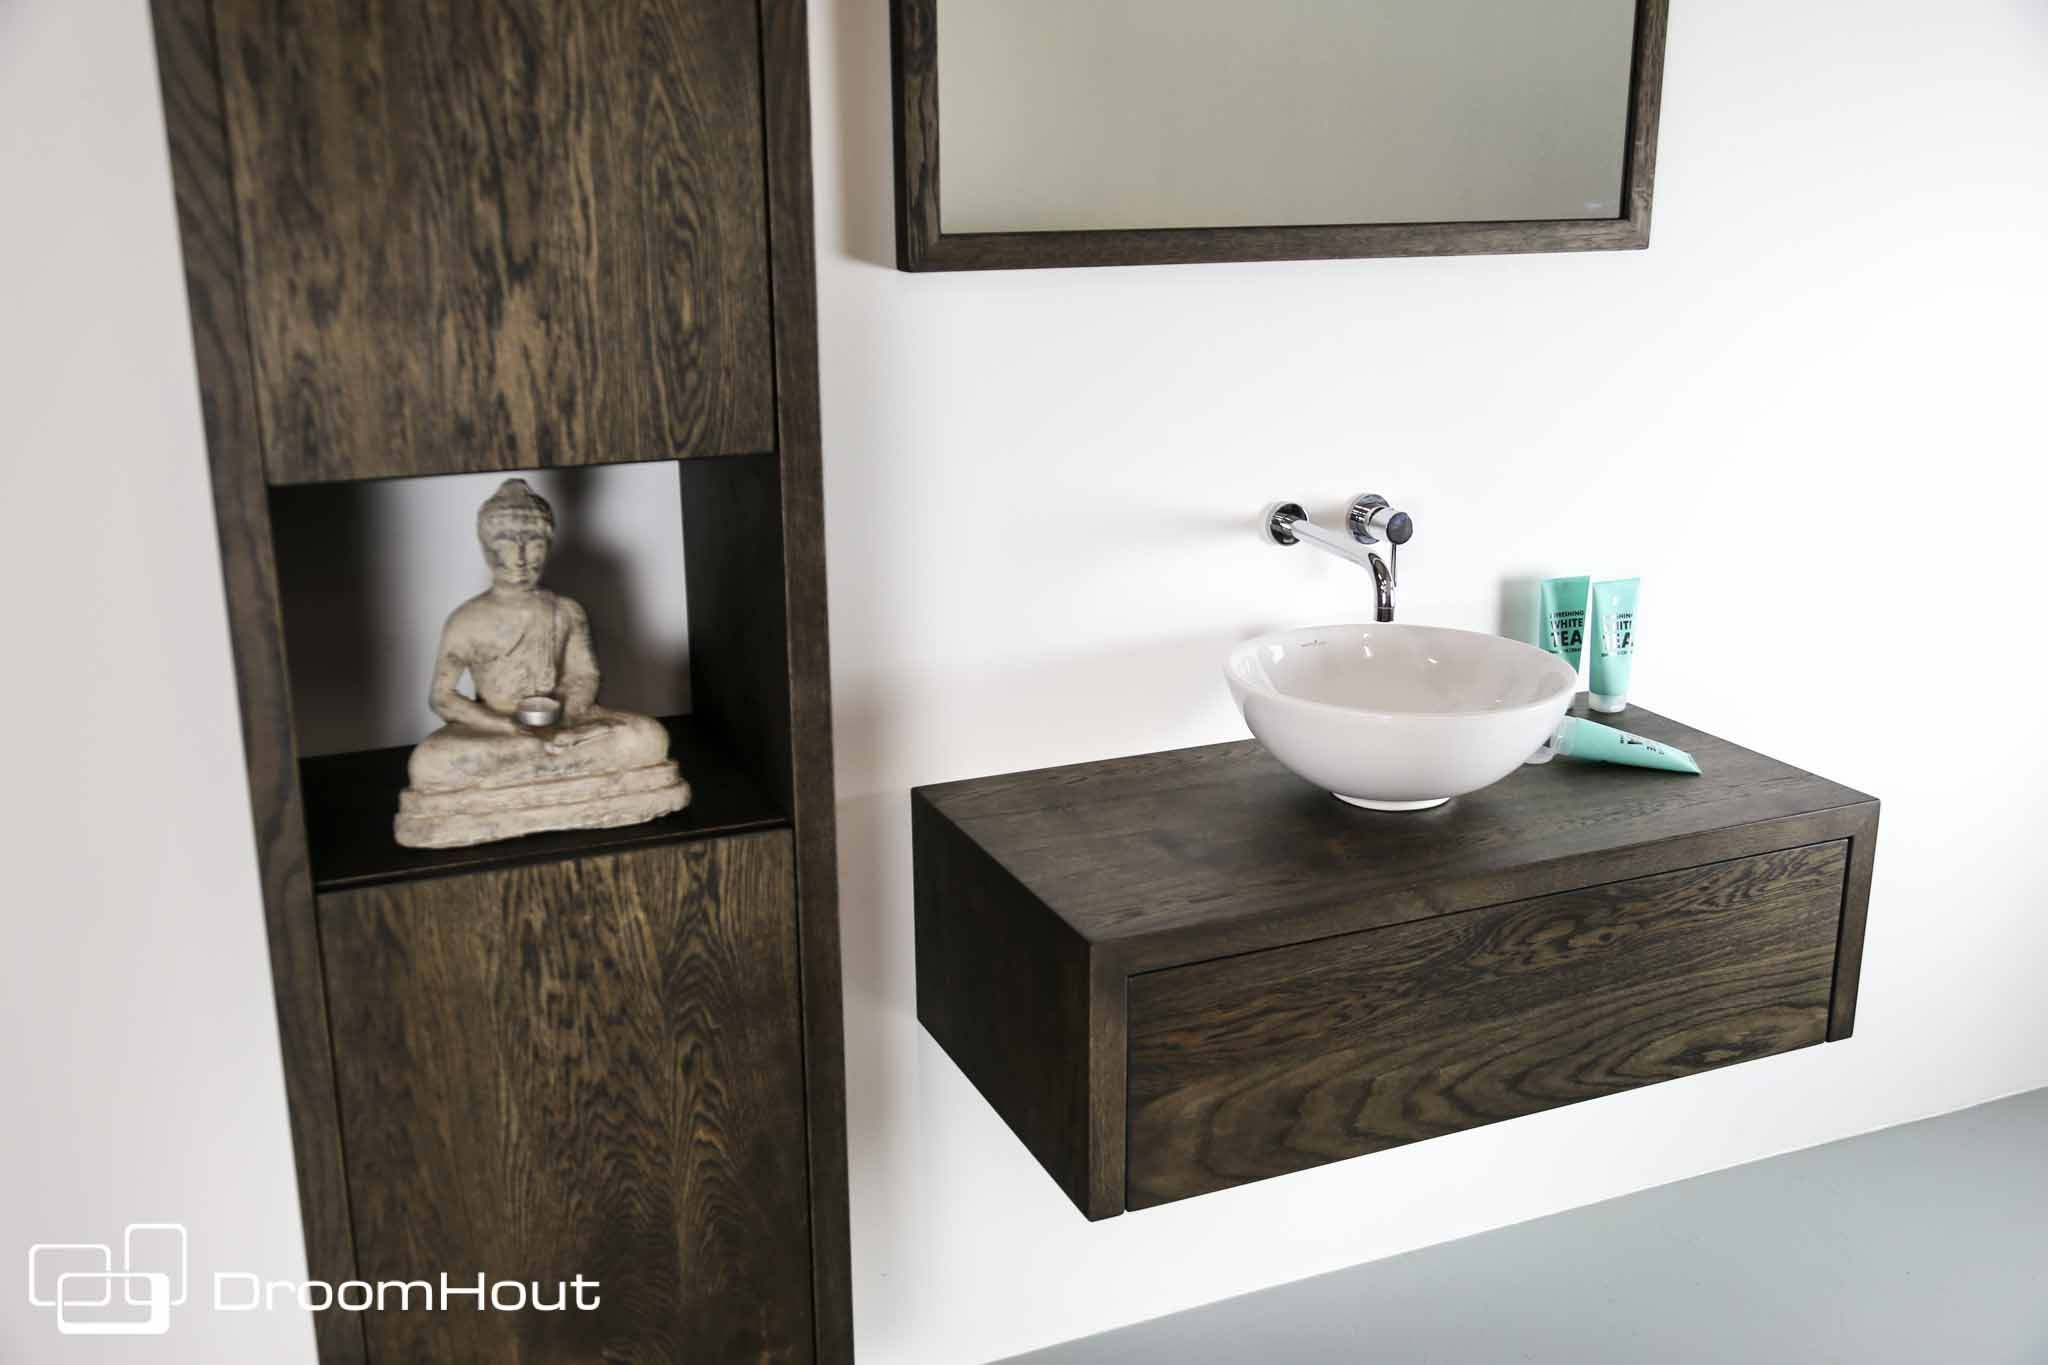 Badkamerkast Op Poten : Badkamermeubel badkamerkast eikenhout spa wonen en design